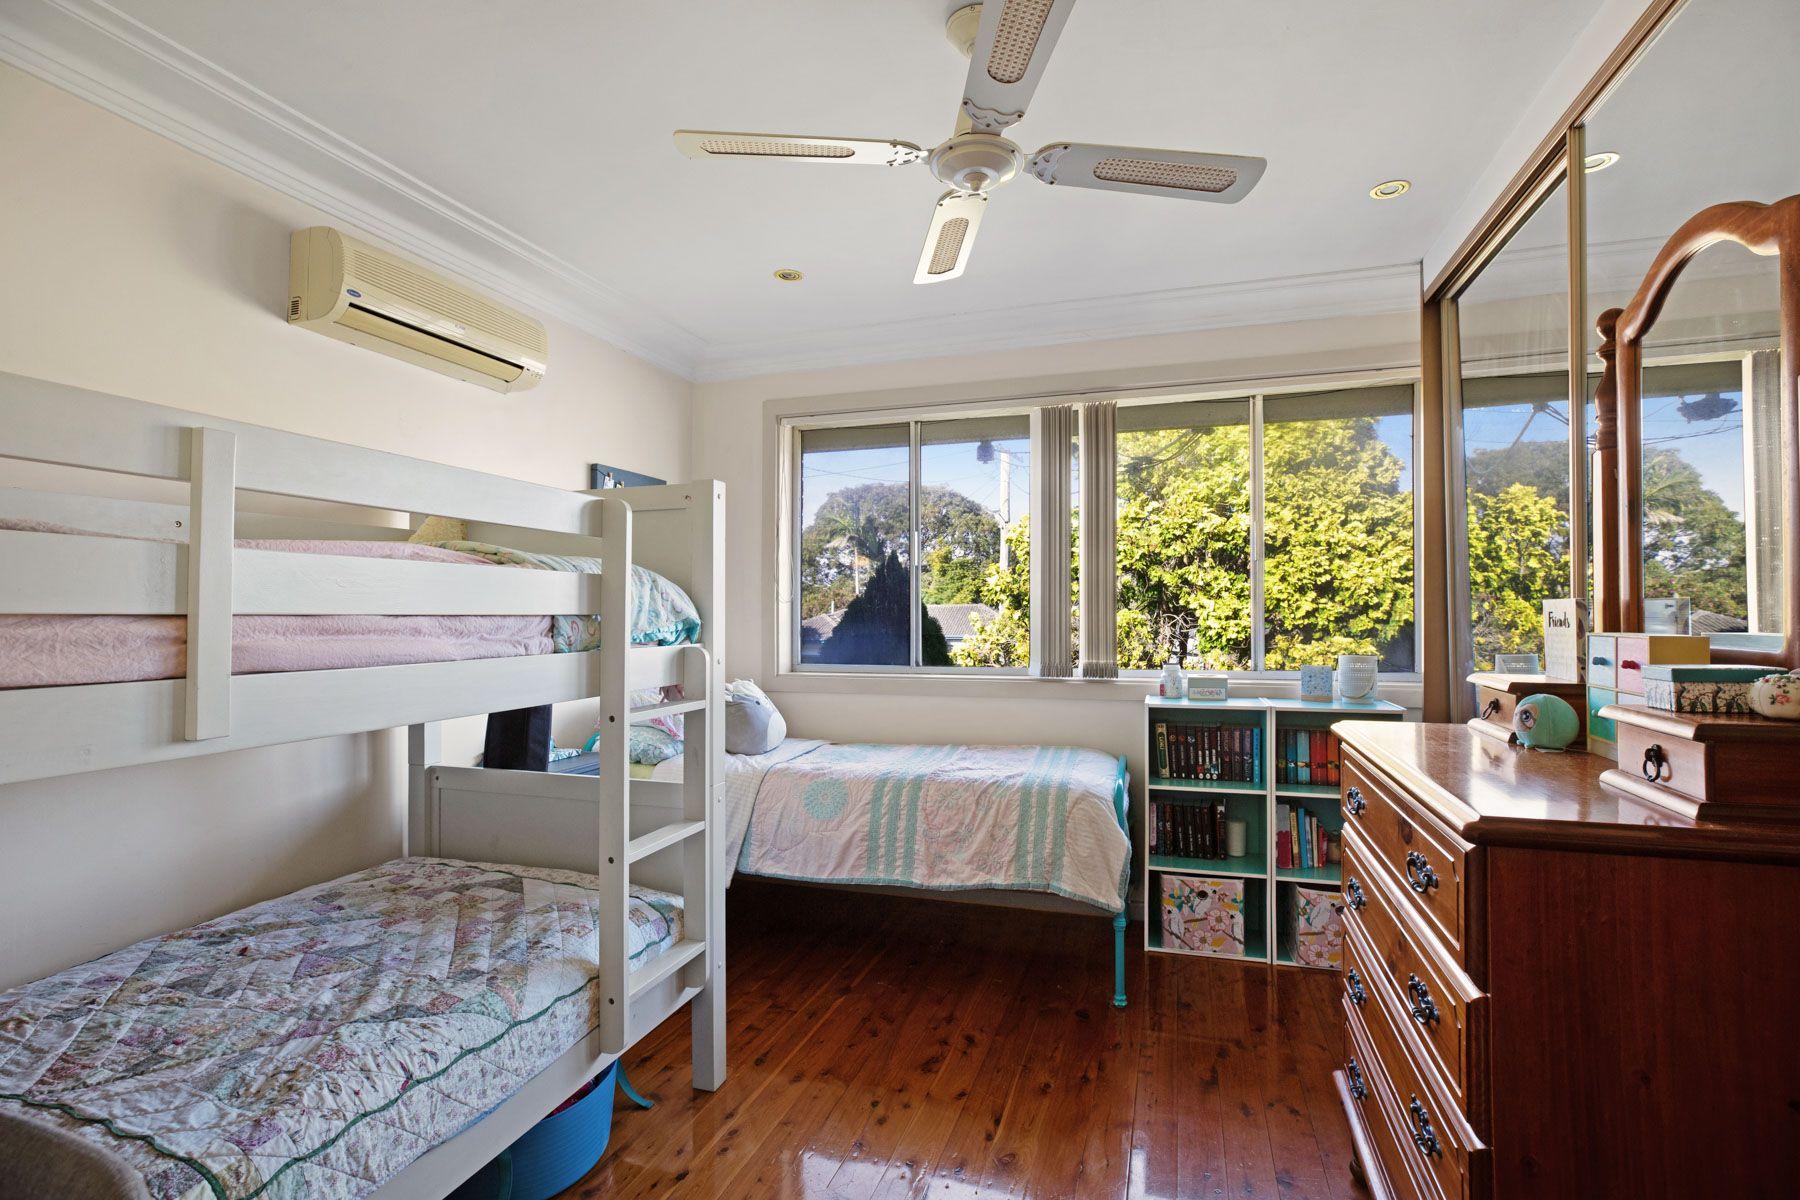 6 Bangalla Street, Belmont North, NSW 2280